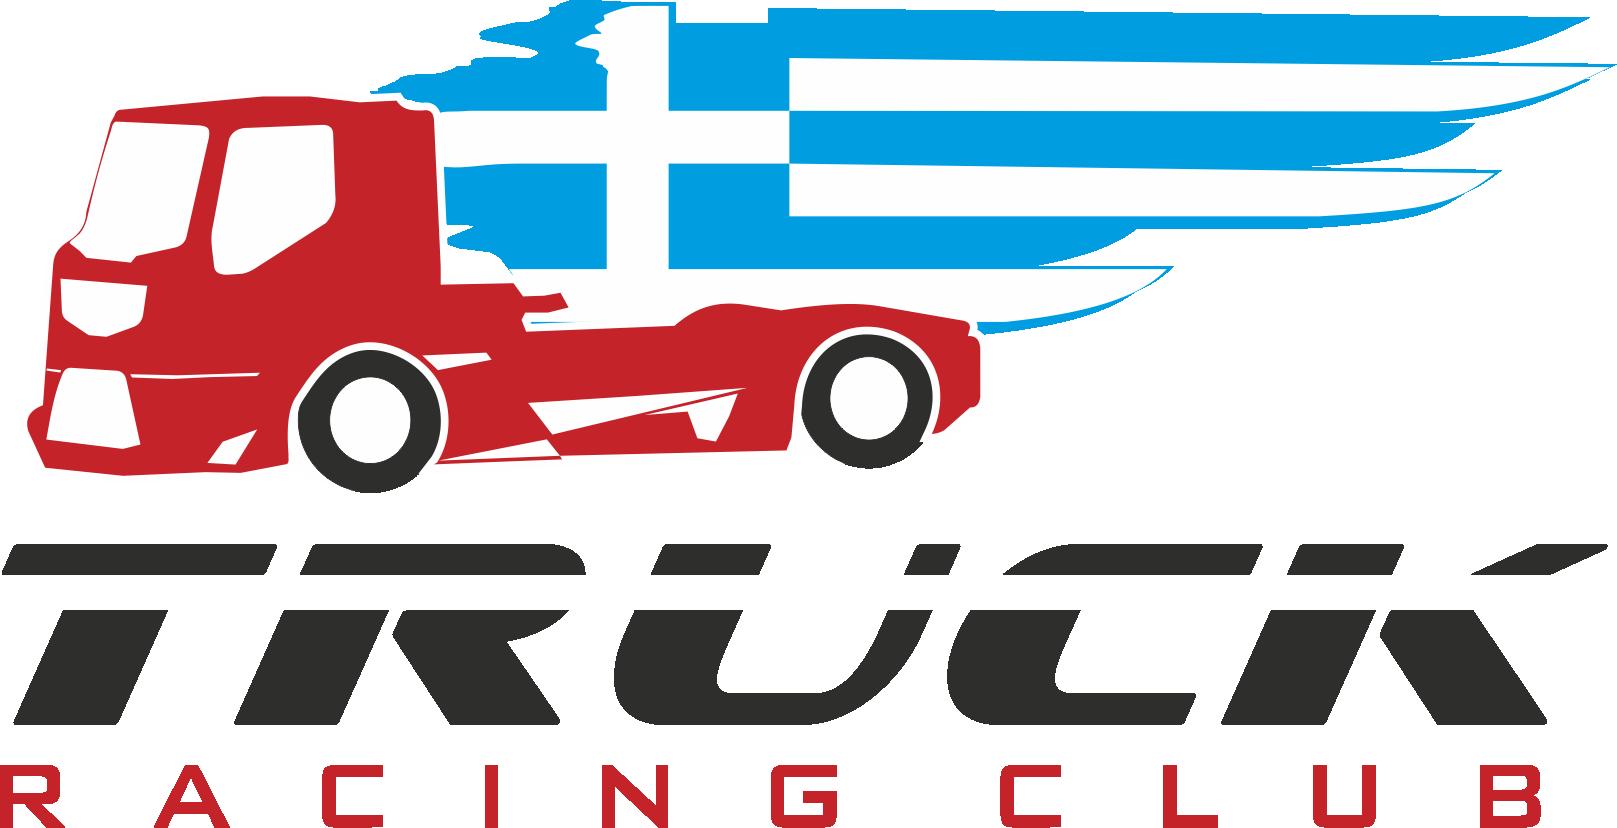 Trucking Logo Clip Art   www.imgkid.com - The Image Kid ...